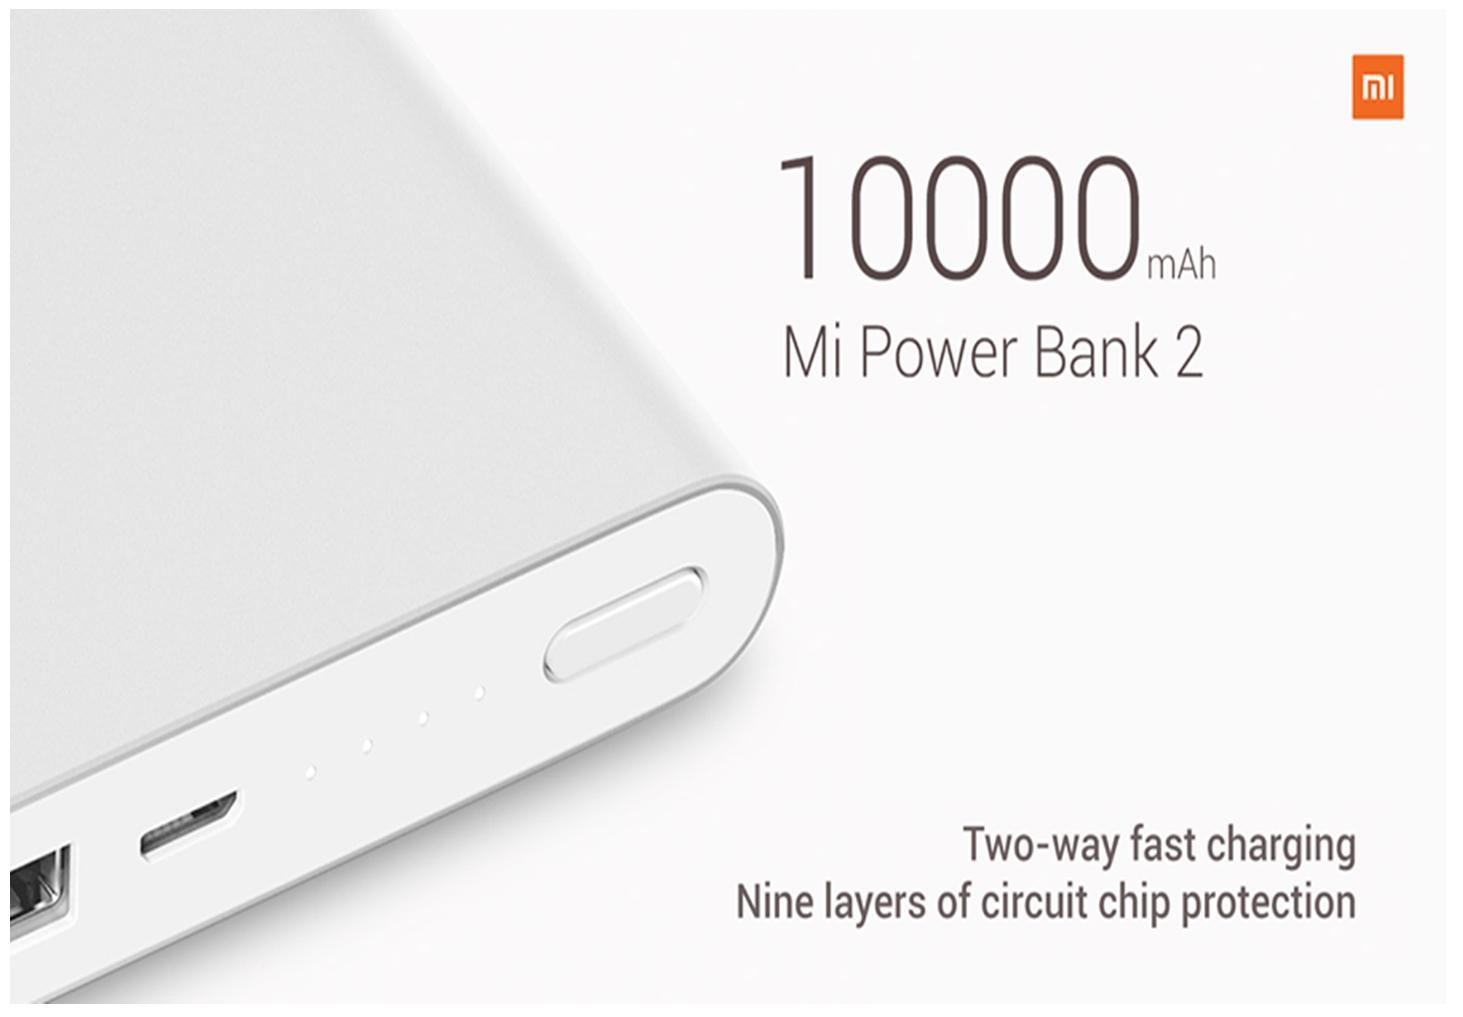 Powerbank Xiaomi Mi 5000mah Original Pb Power Bank Xiao 5000 Mah Ori 10000mah Fast Charge Generasi 2 Silver